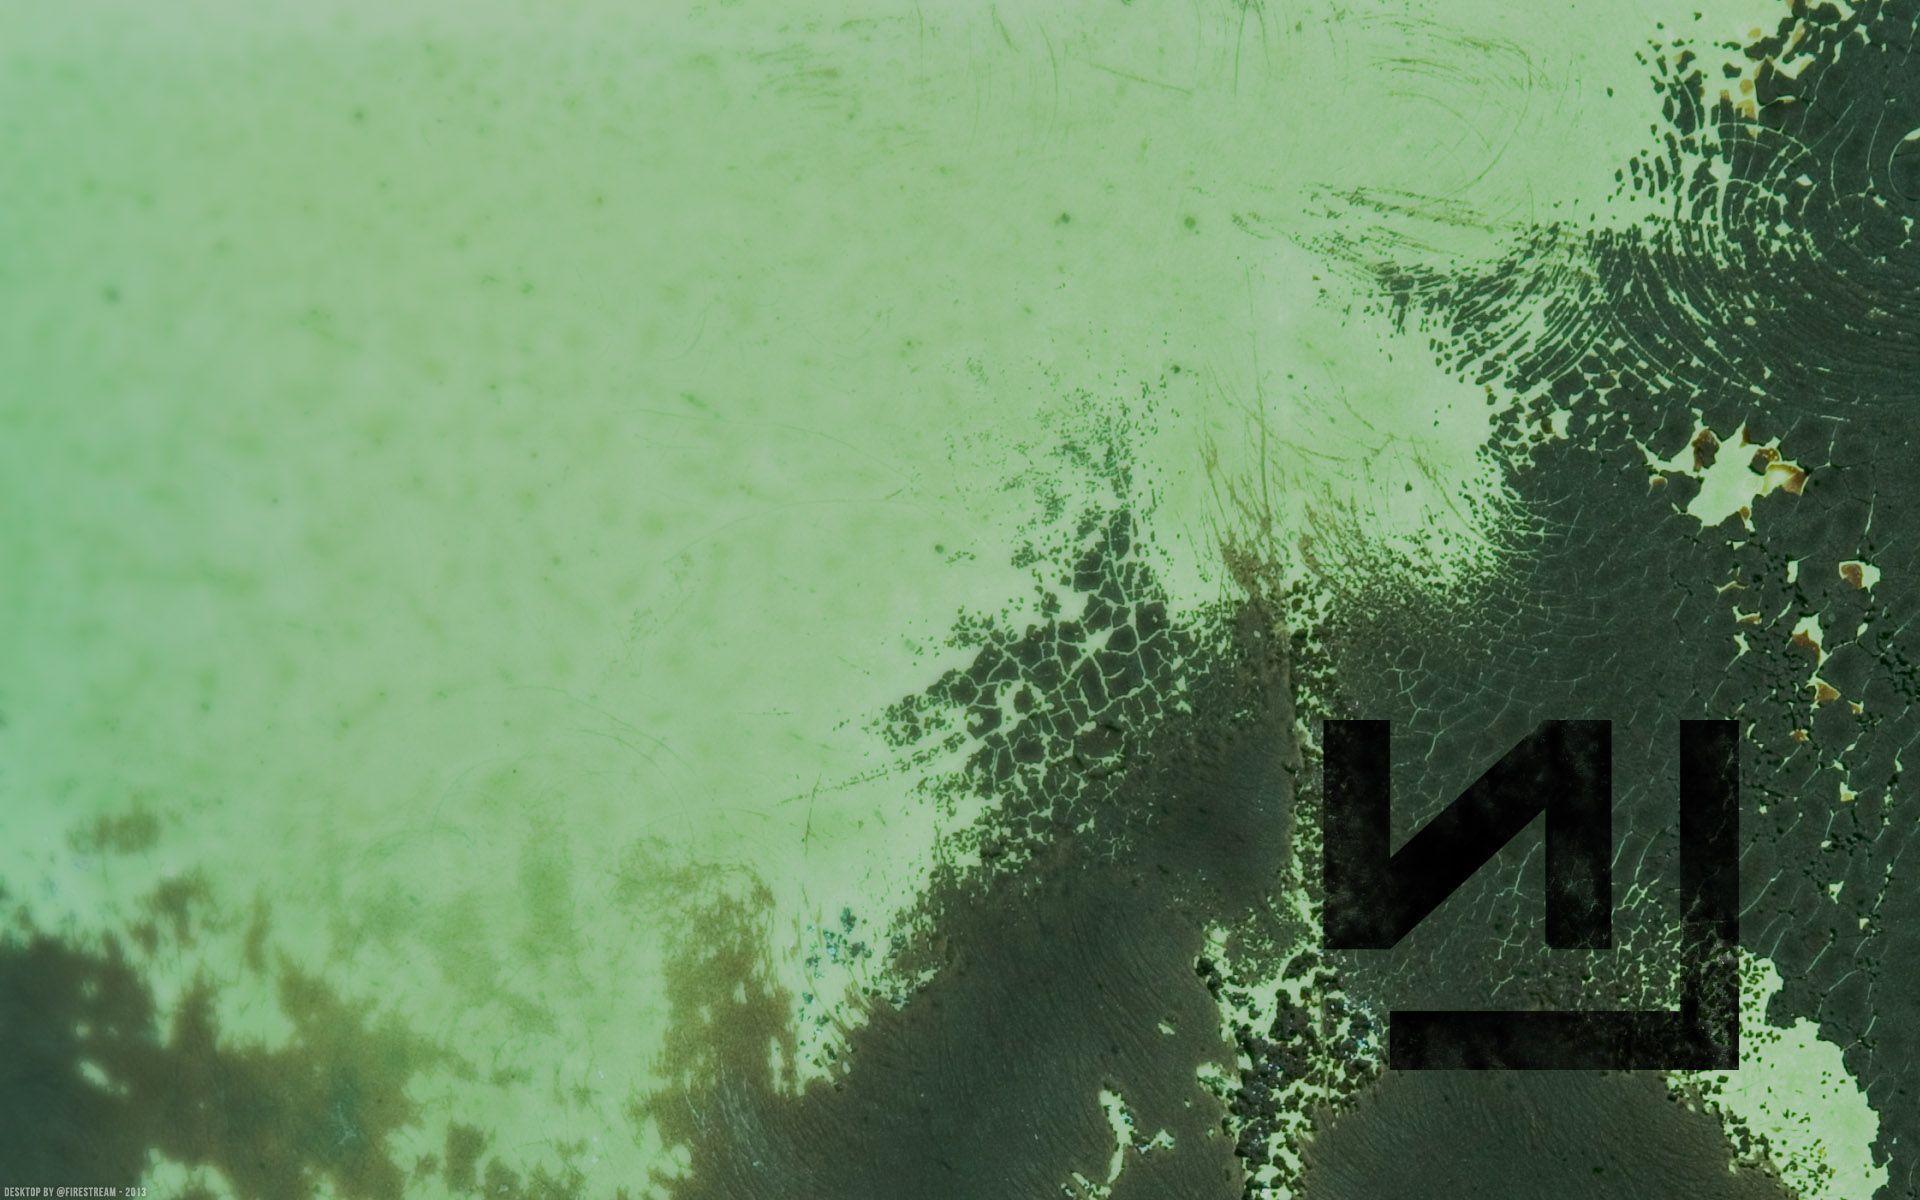 Nin Backgrounds - Wallpaper Cave